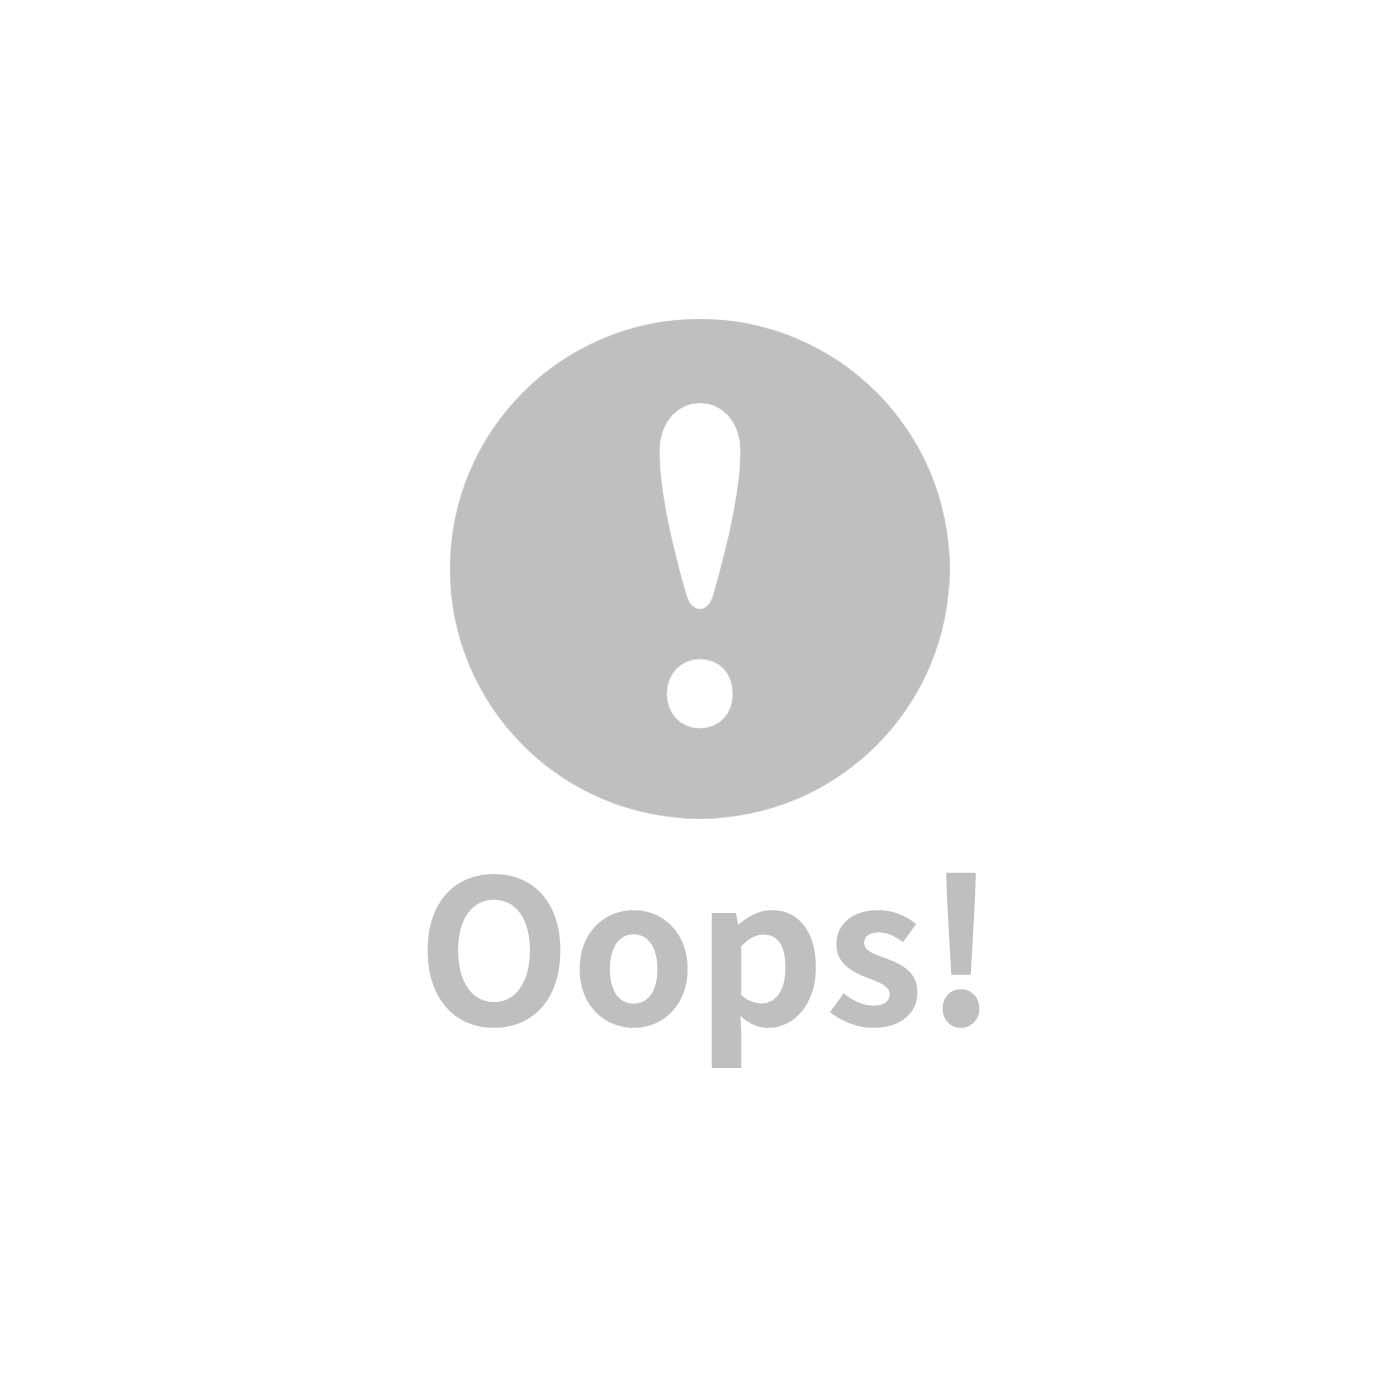 FEERIA妃芮亞時尚媽媽包組-拉鍊款-希臘紫鳶花